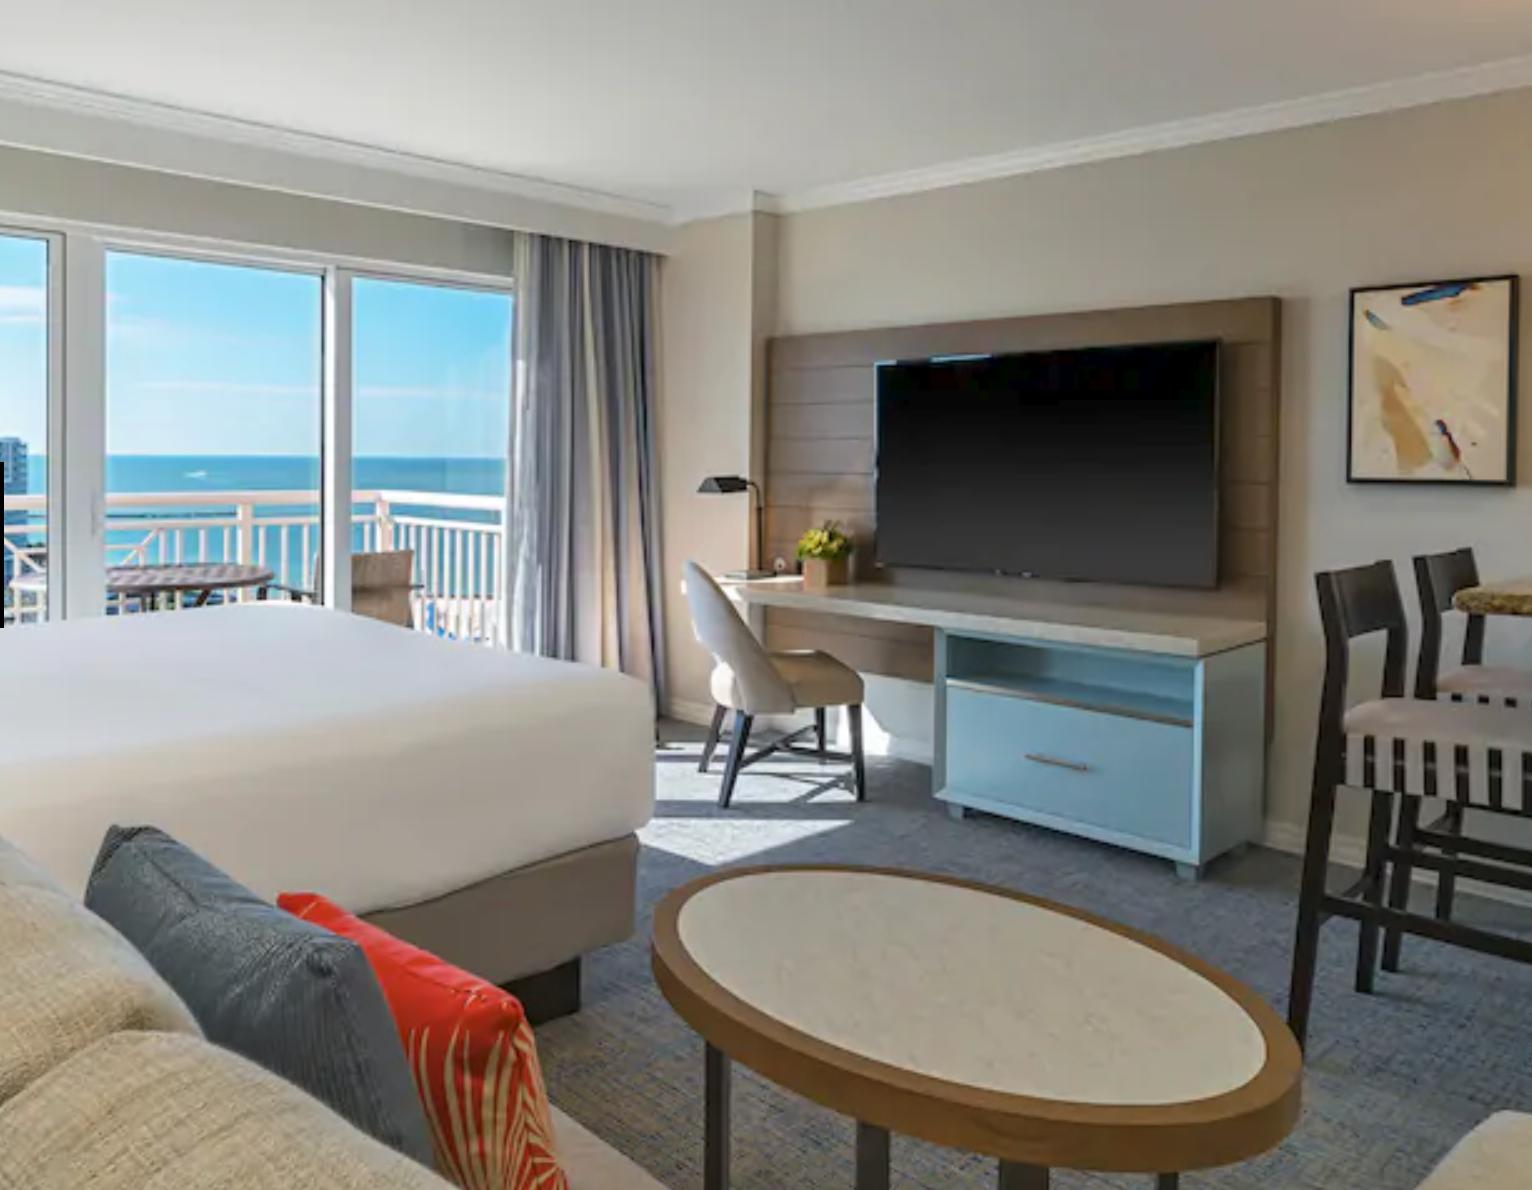 https://www.hotelsbyday.com/_data/default-hotel_image/4/20470/screenshot-2020-08-13-at-12-49-32-pm.png